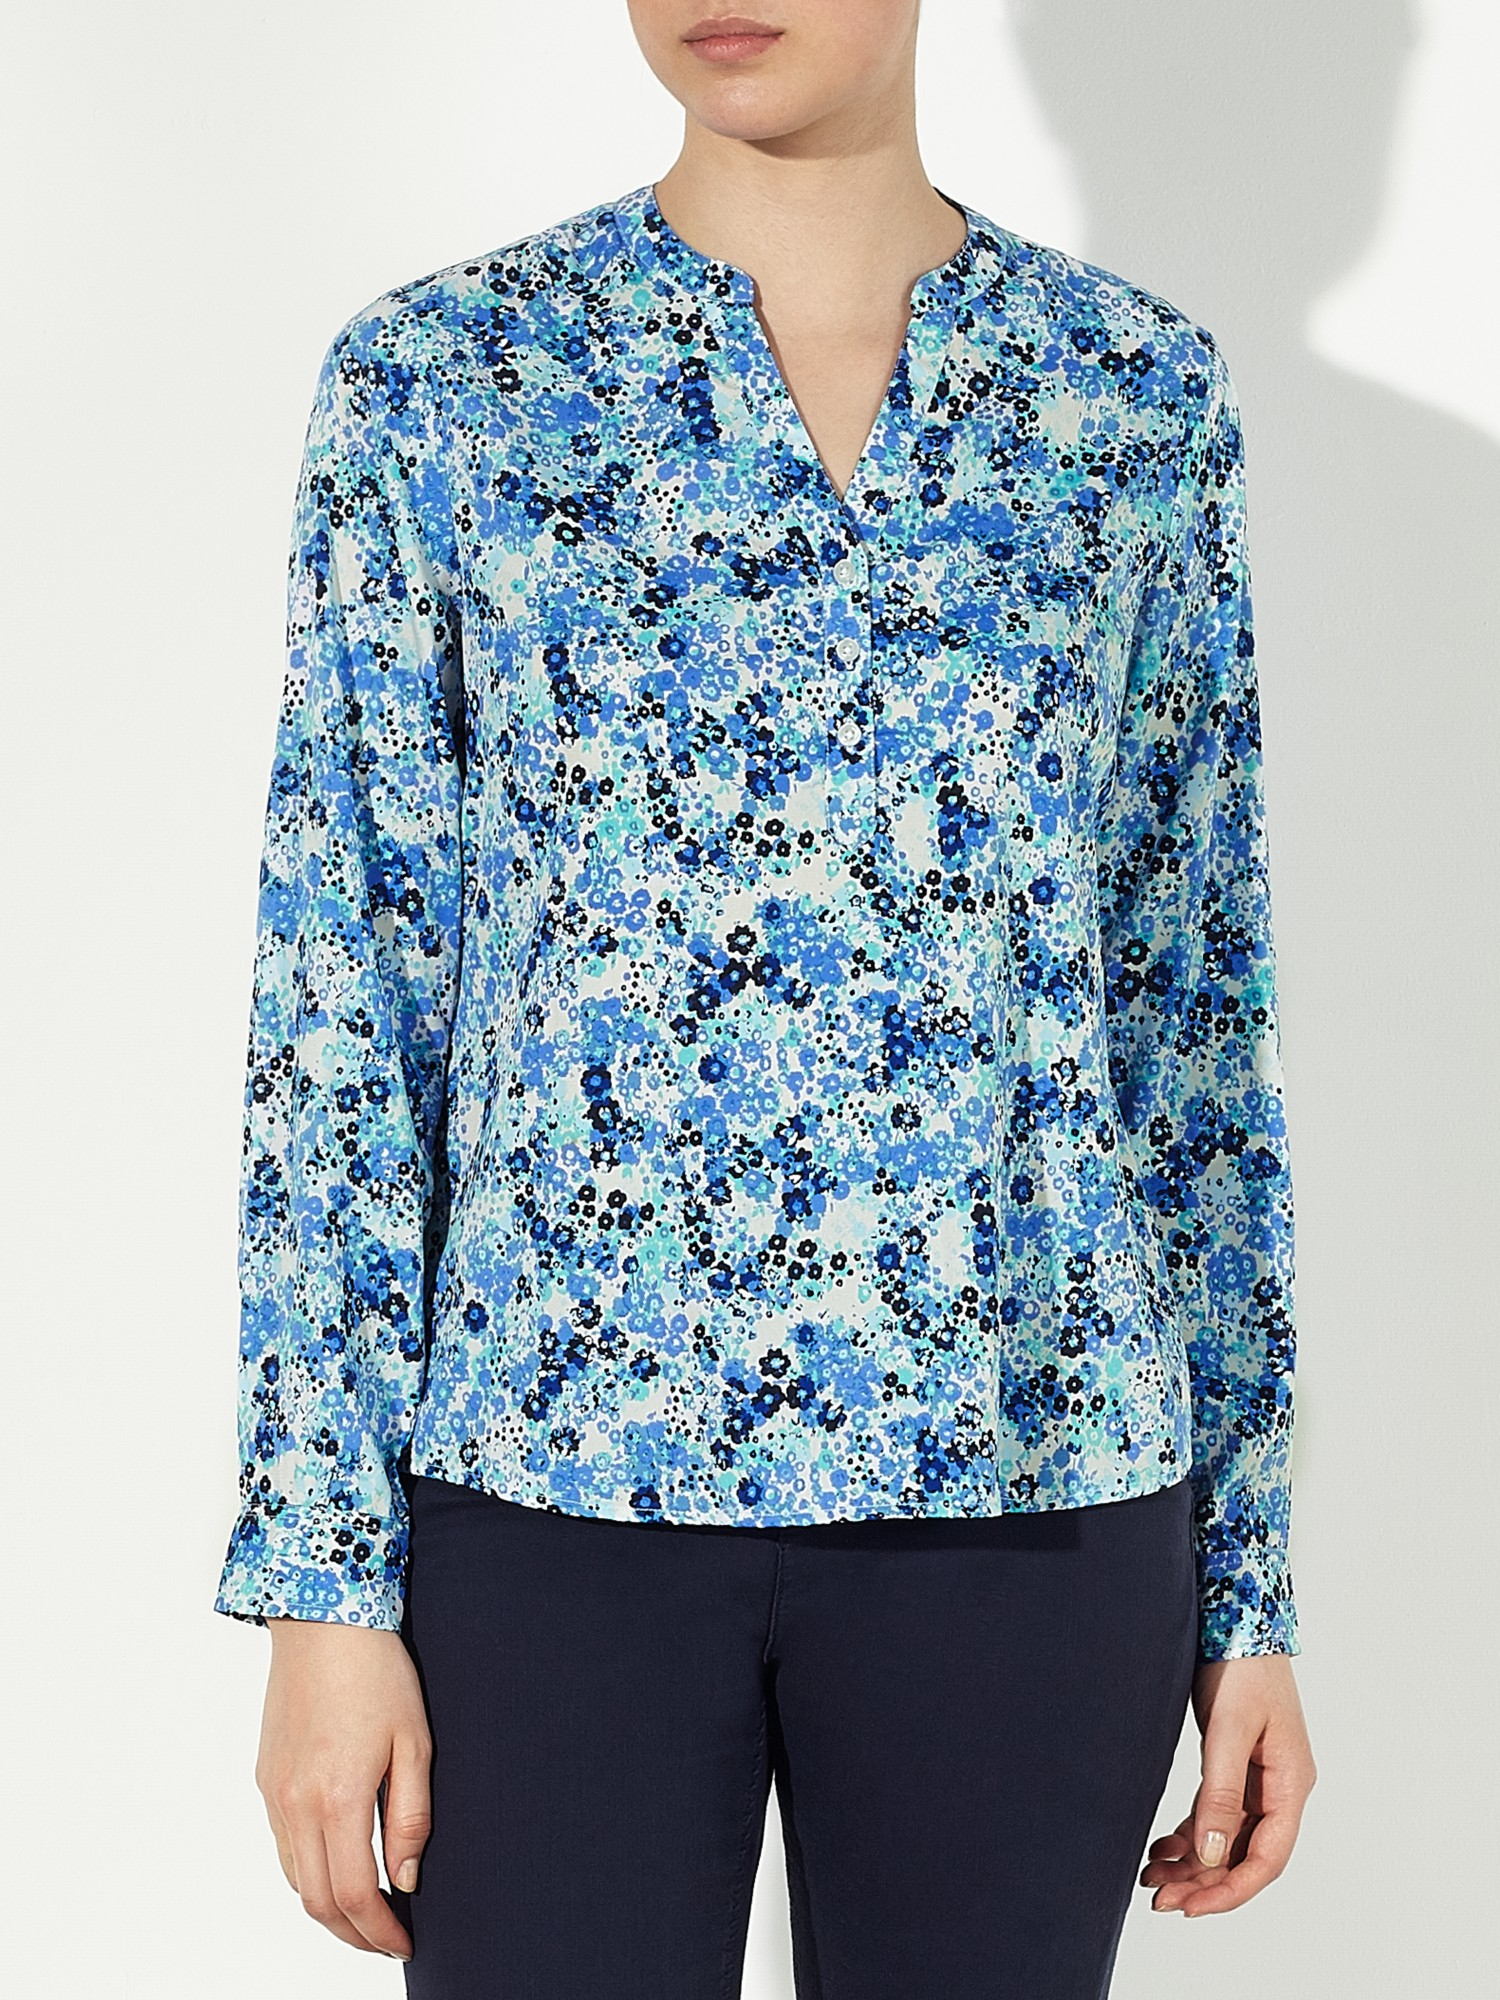 John Lewis Denim Garden Print Popover Tunic Top in Blue